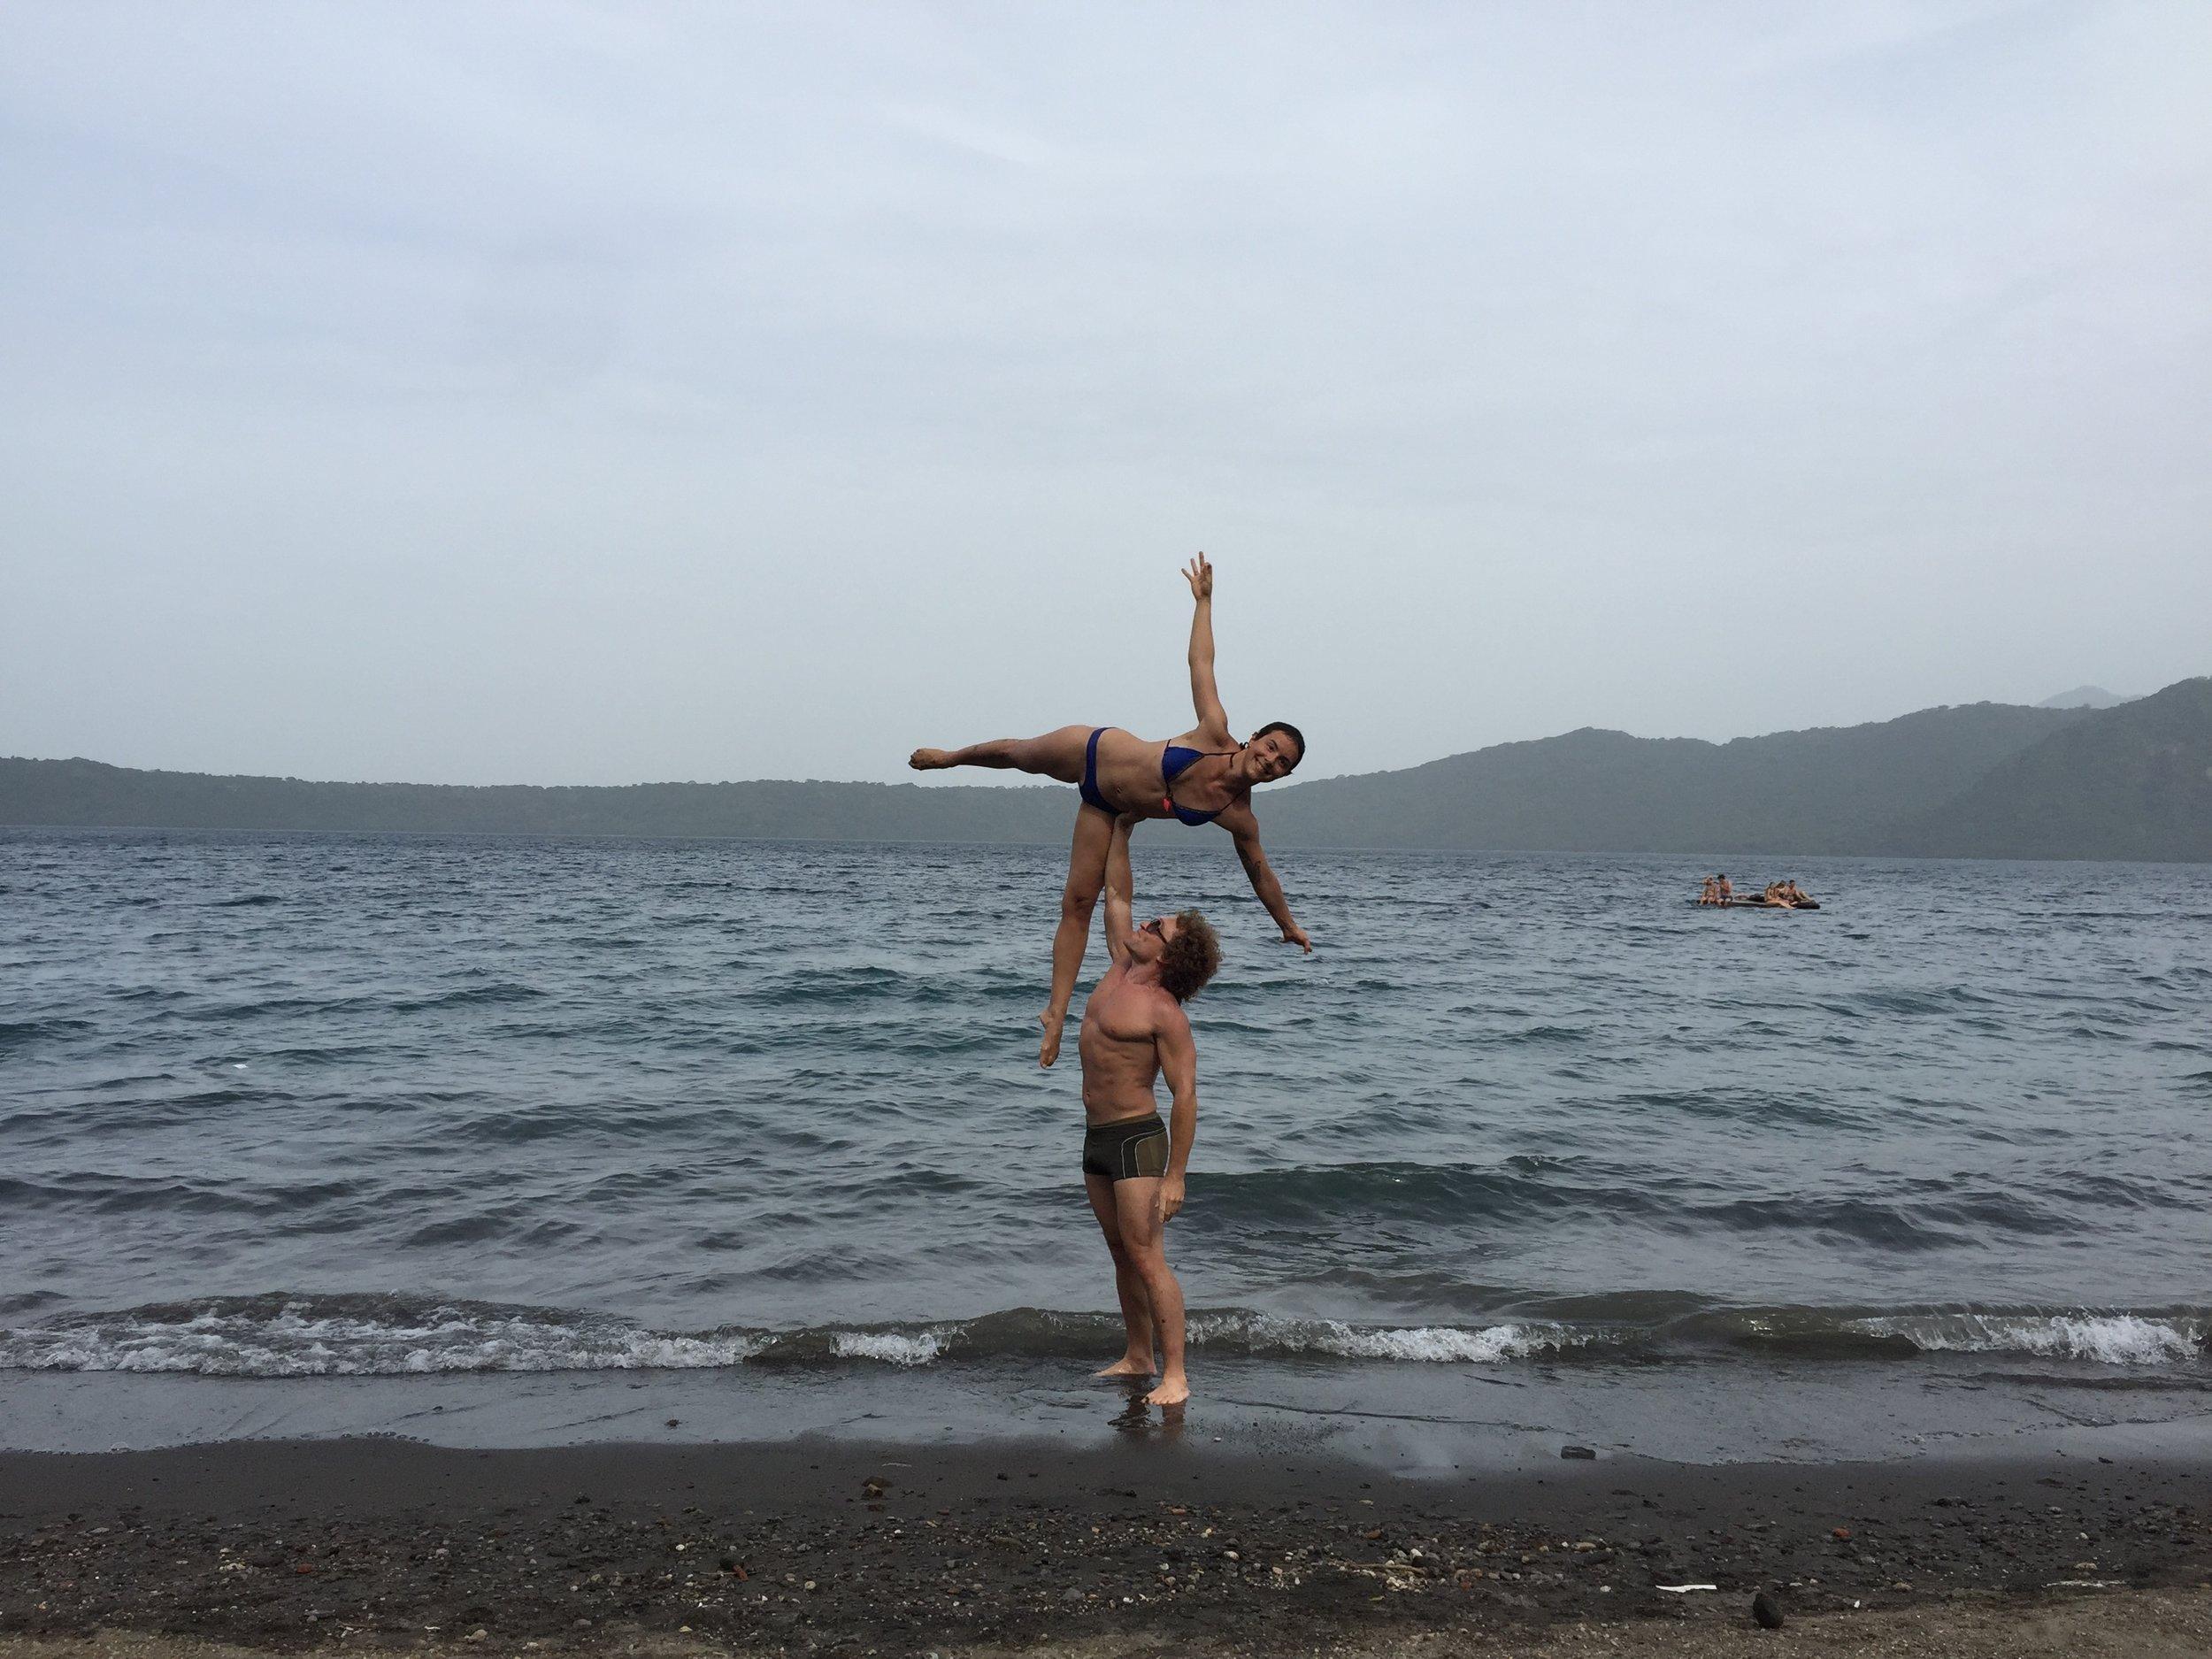 AcroYoga by the Ocean 3